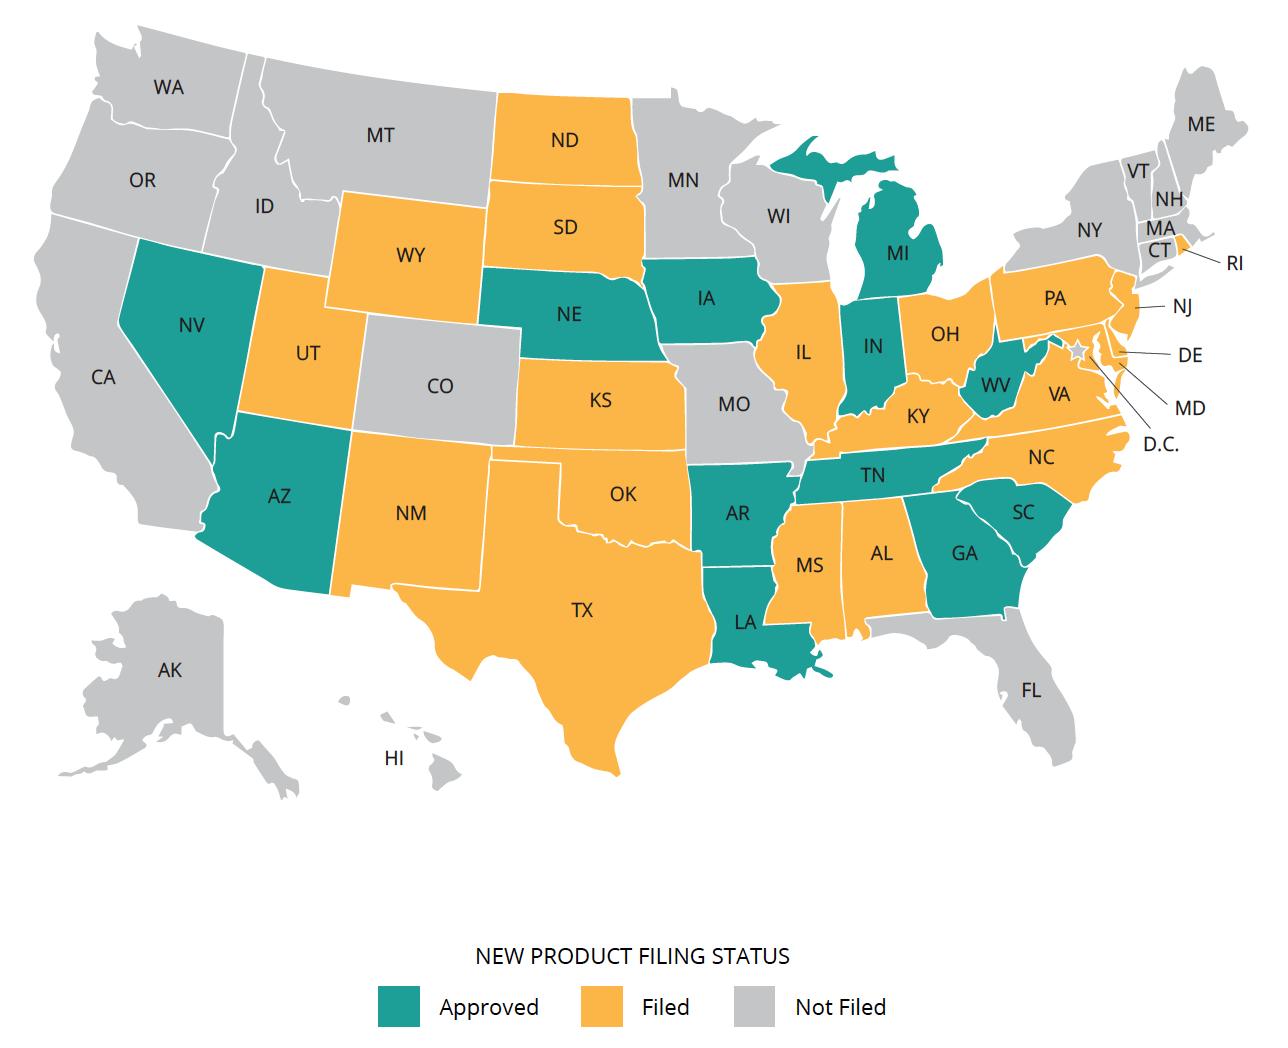 ManhattanLife Assurance State Filing Map